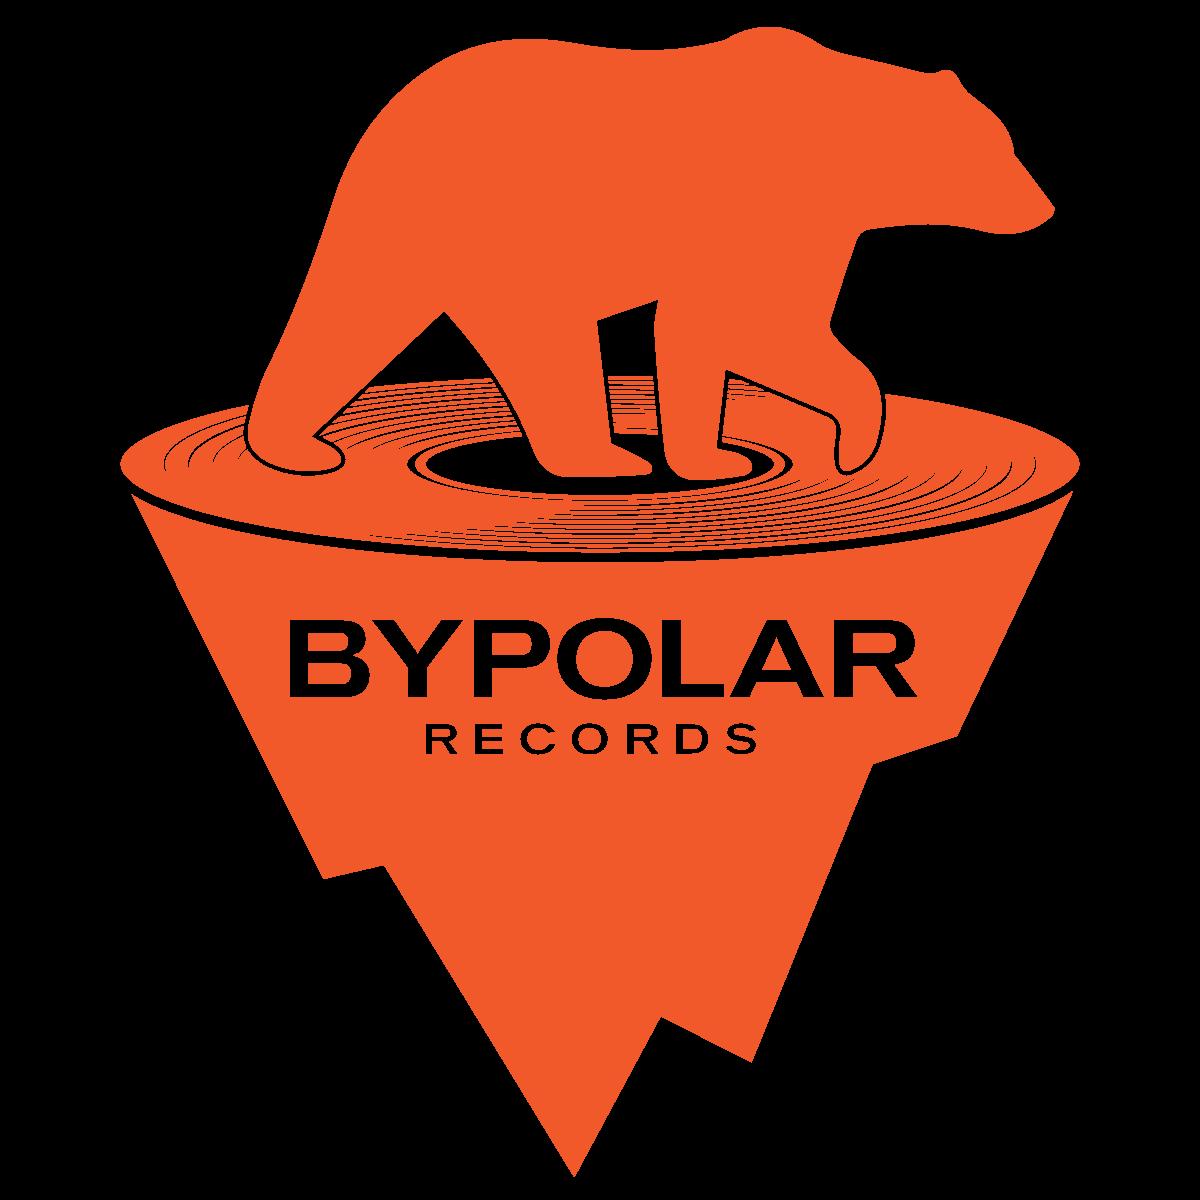 Bypolar Records